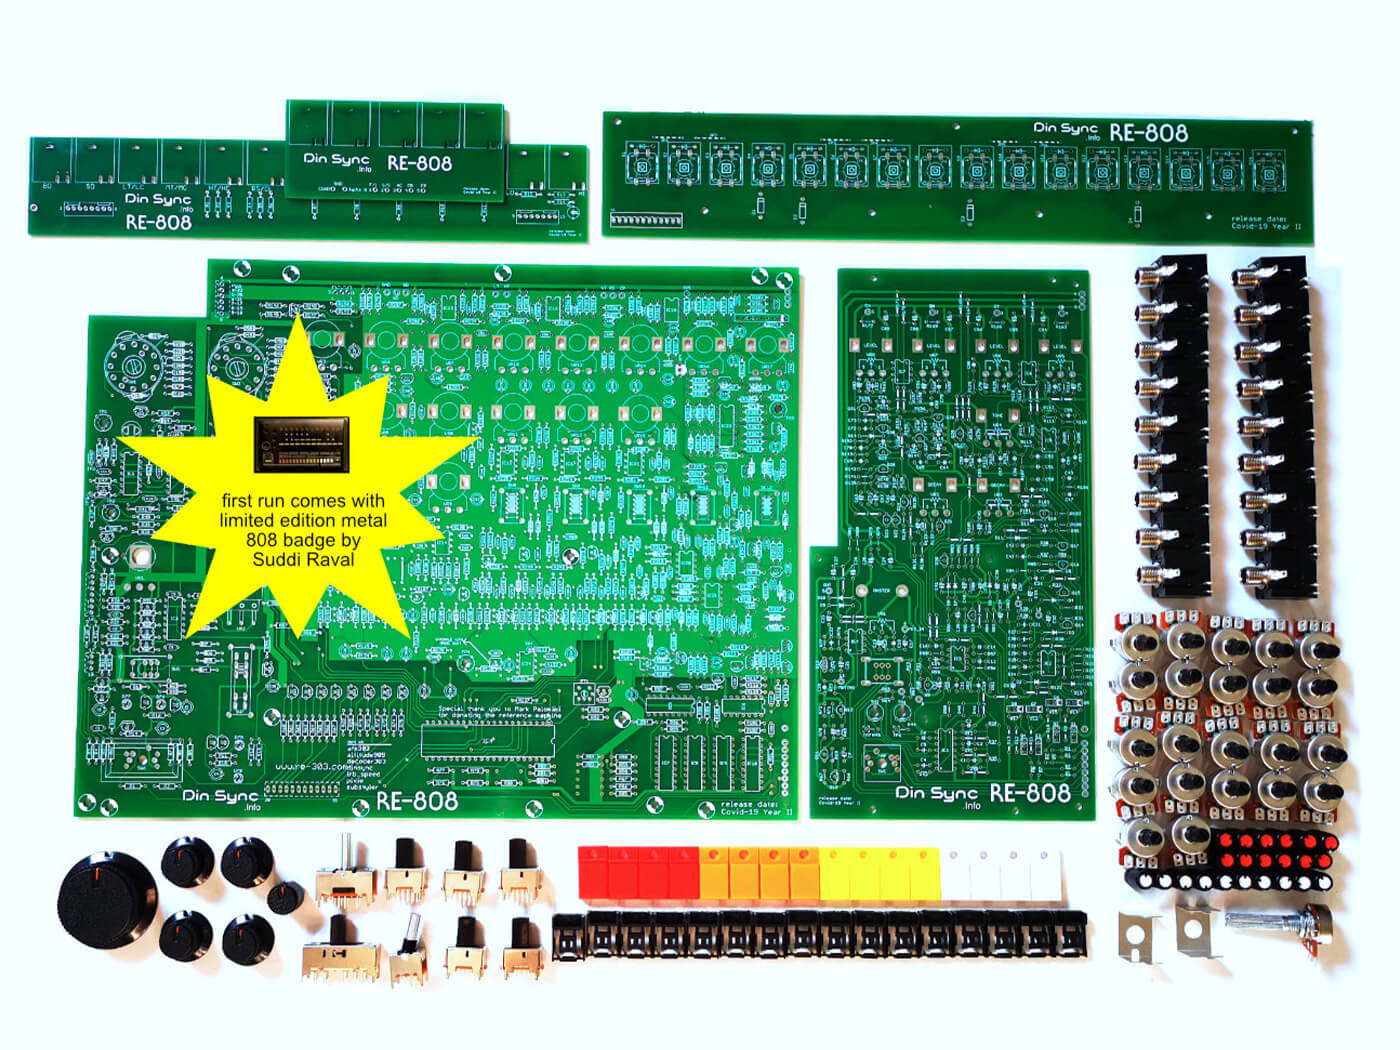 DinSync RE-808